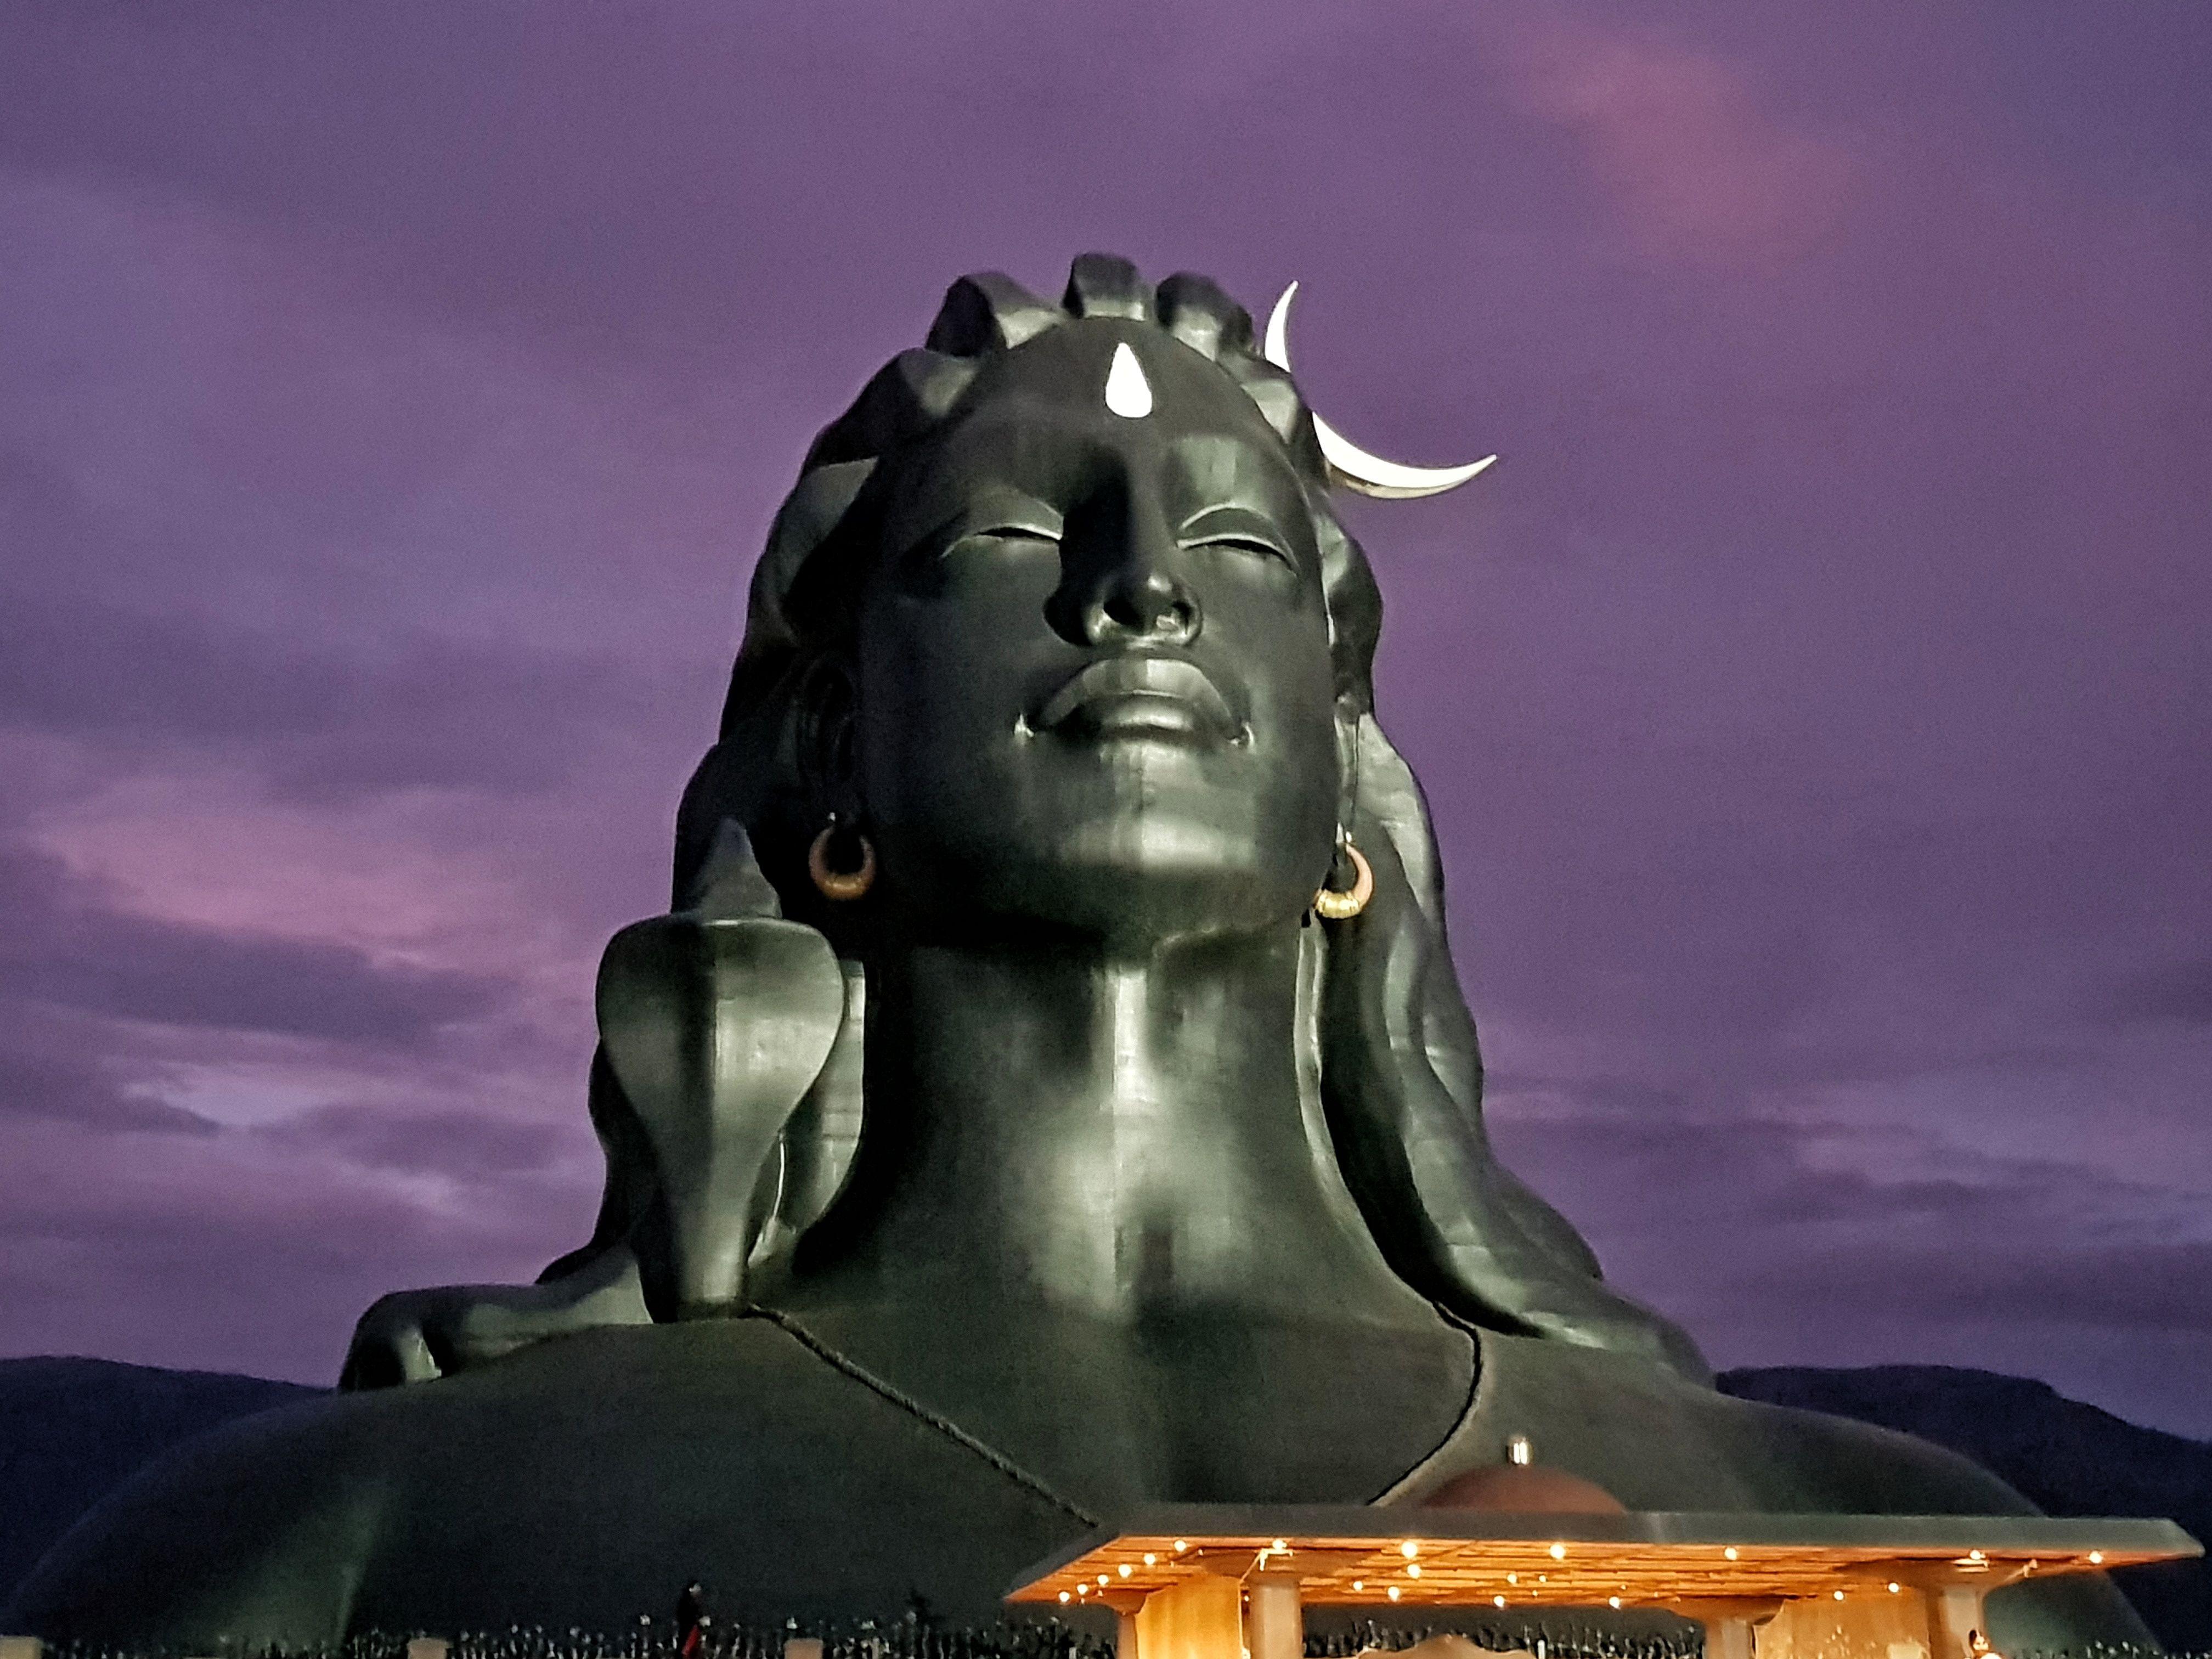 60 Shiva Adiyogi Wallpapers Hd Free Download For Mobile And Desktop Isha Yoga Guinness Book Of World Records Shiva